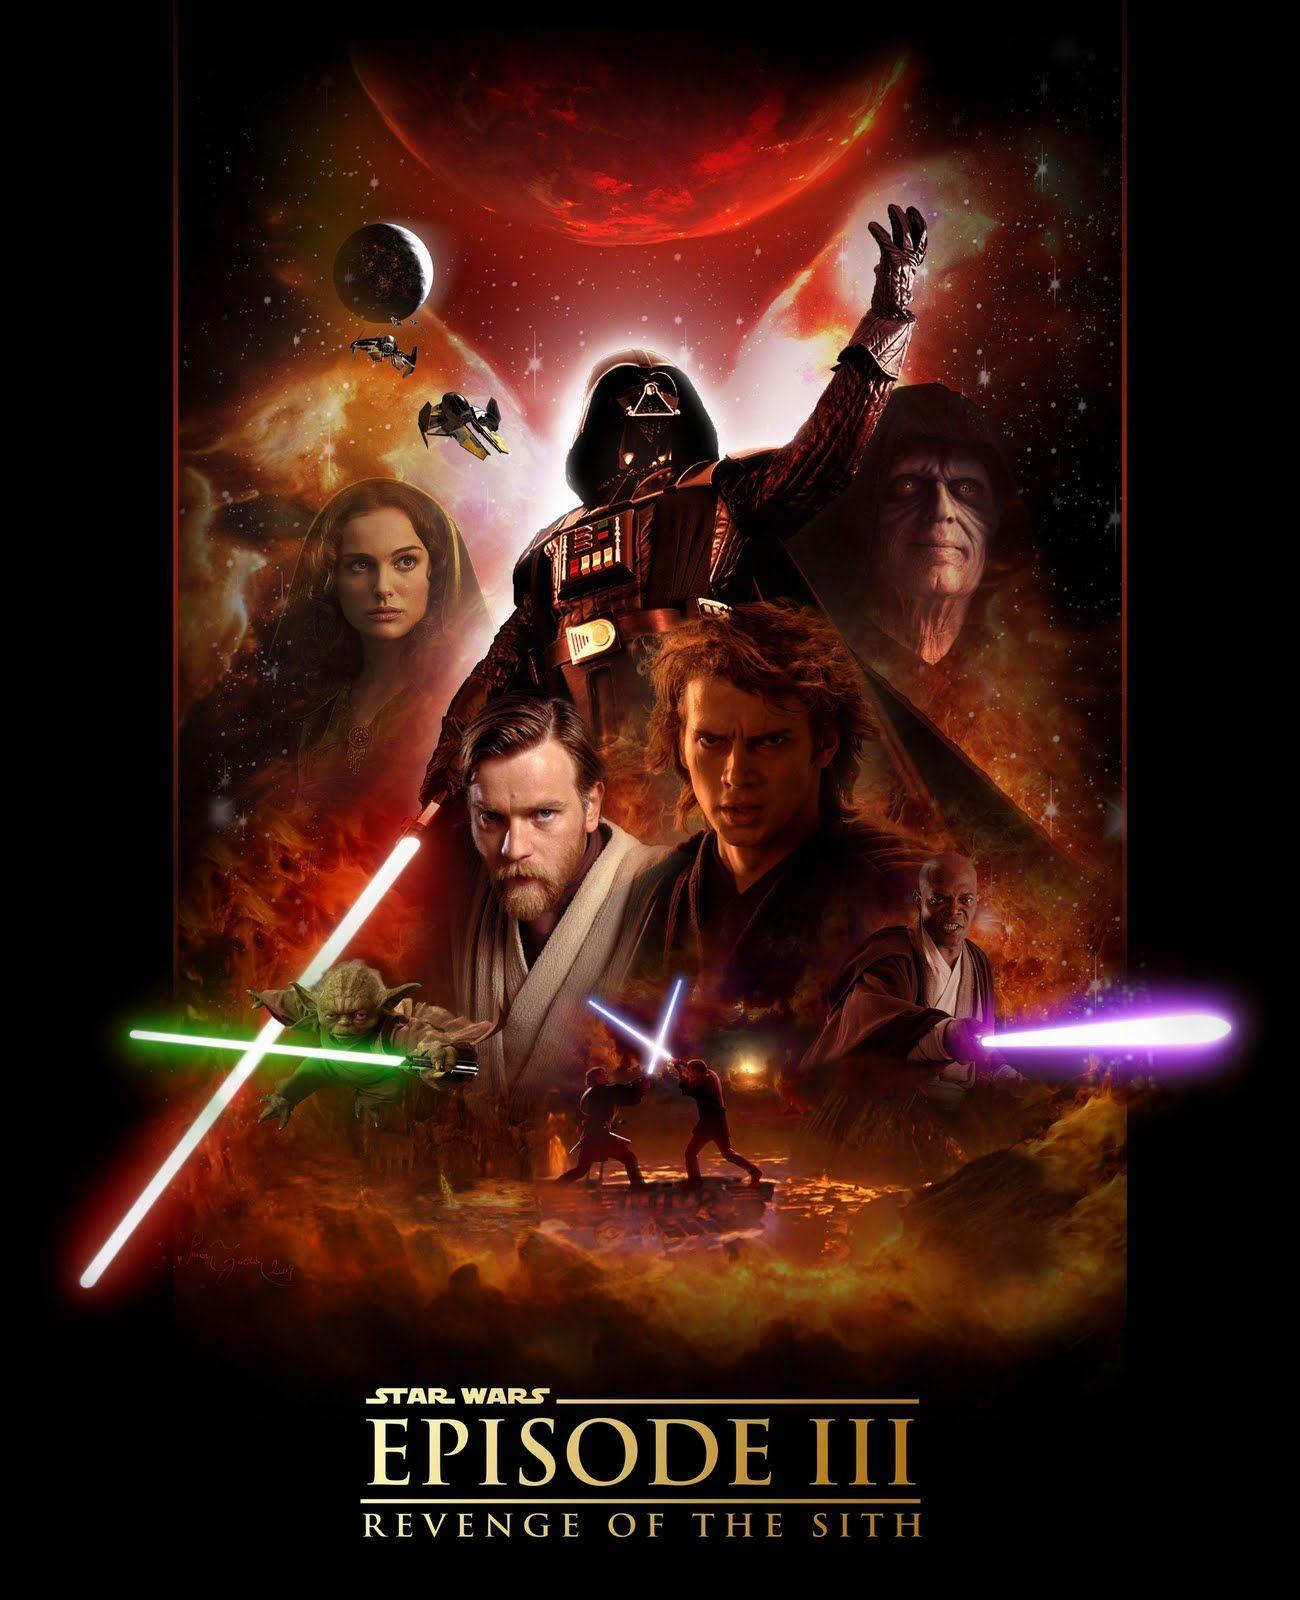 Star Wars Episode Iii Revenge Of The Sith 2005 Star Wars Movies Posters Star Wars Episodes Star Wars Film